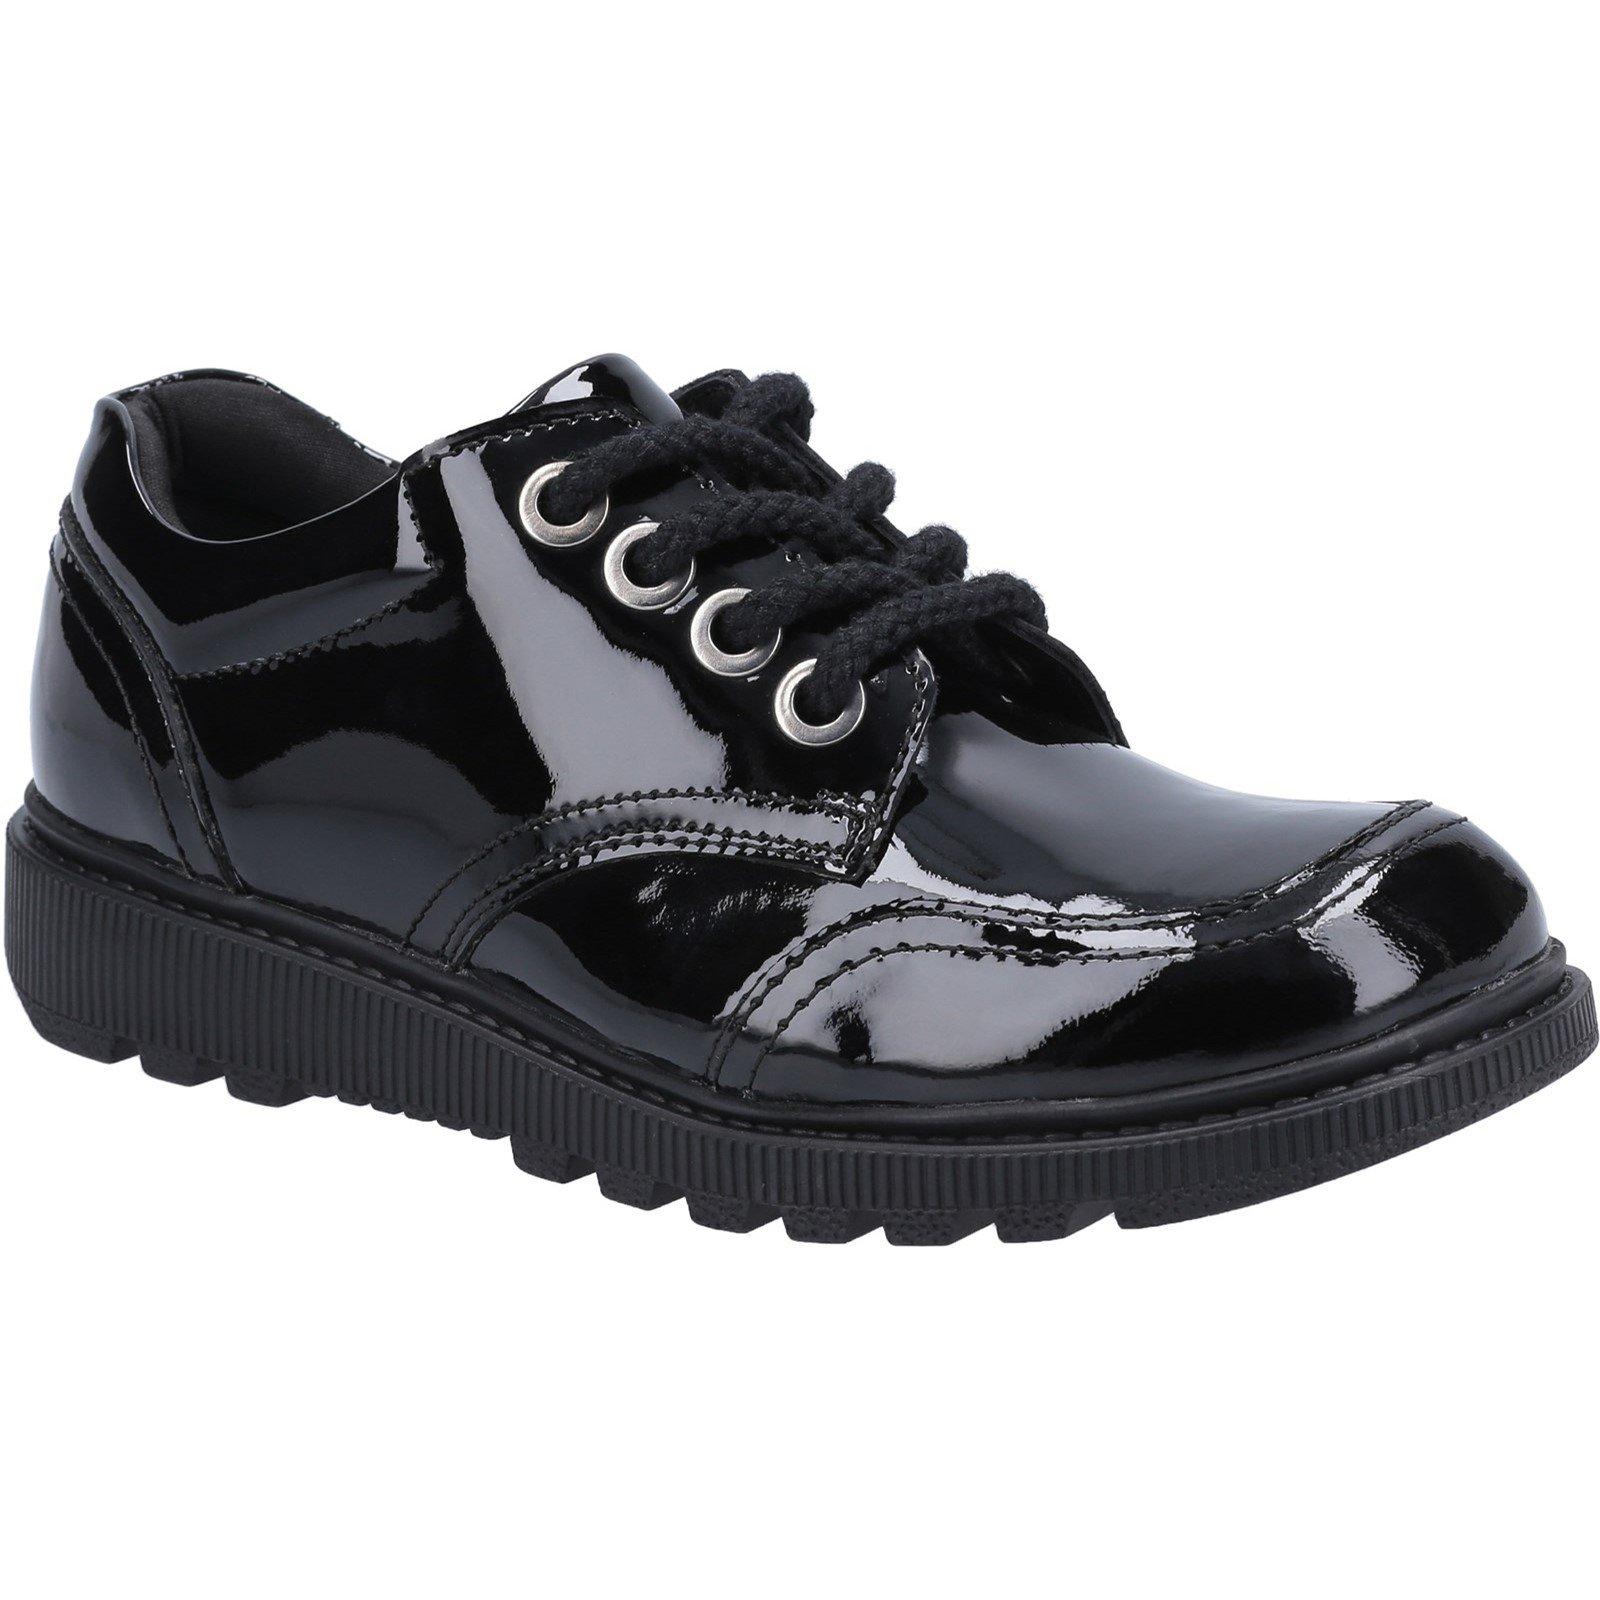 Hush Puppies Kid's Kiera Senior Patent School Shoe Black 30824 - Patent Black 4